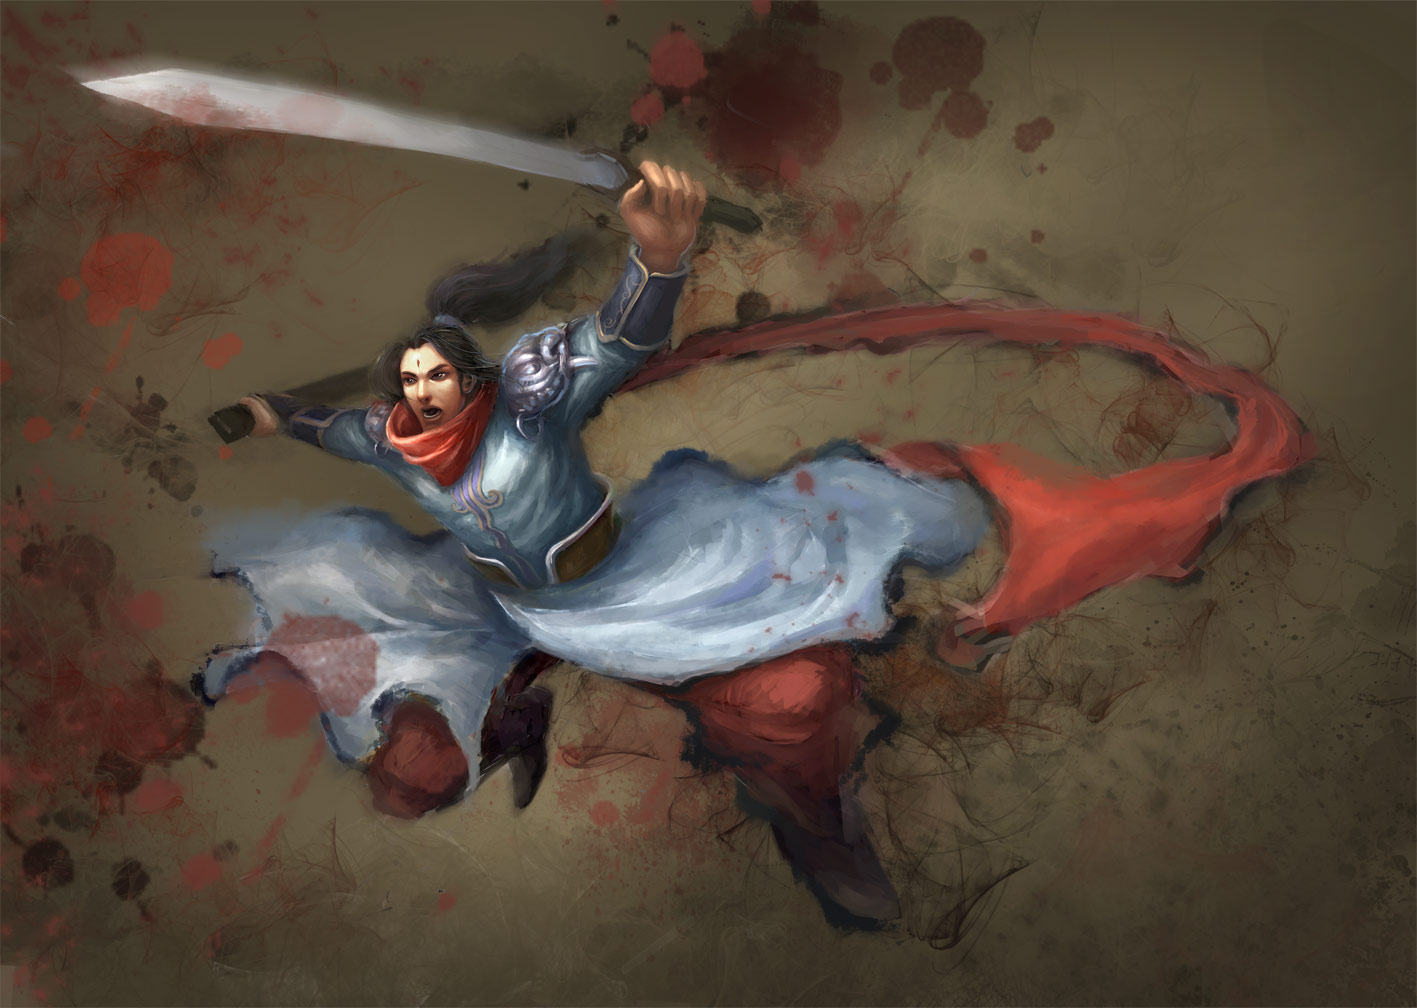 swordsman22